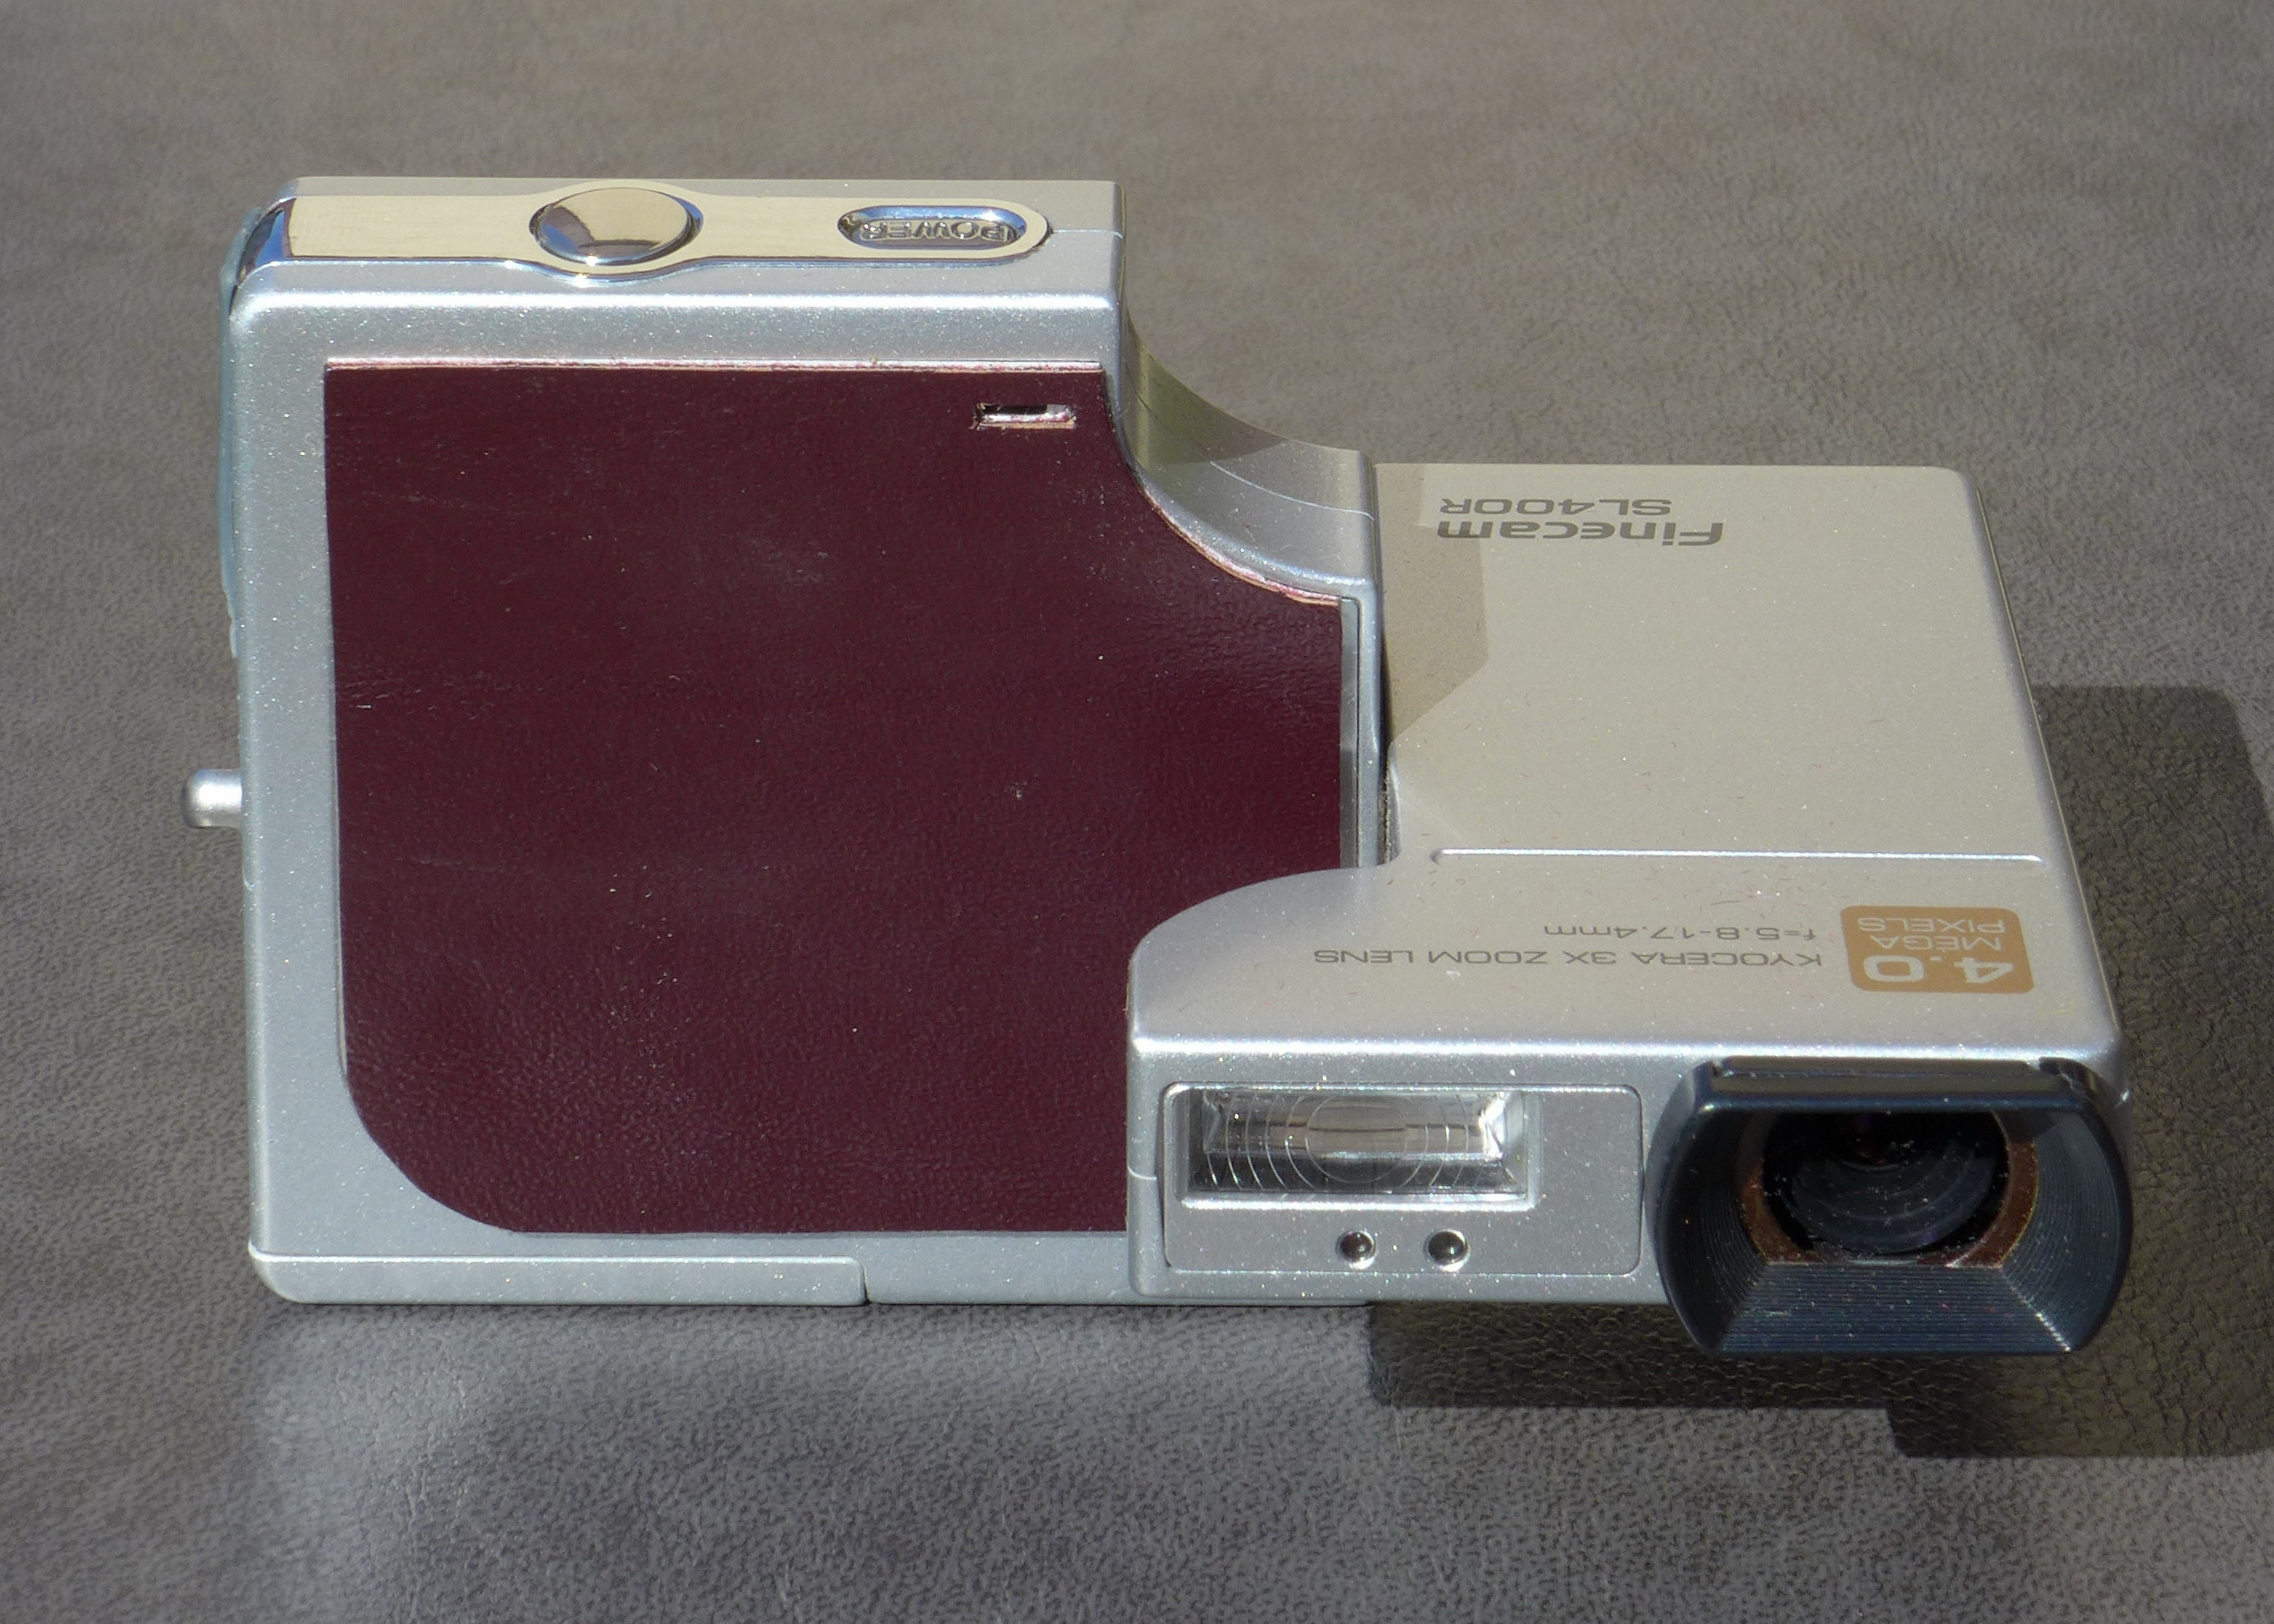 KYOCERA FINECAM SL400R WINDOWS 7 X64 DRIVER DOWNLOAD